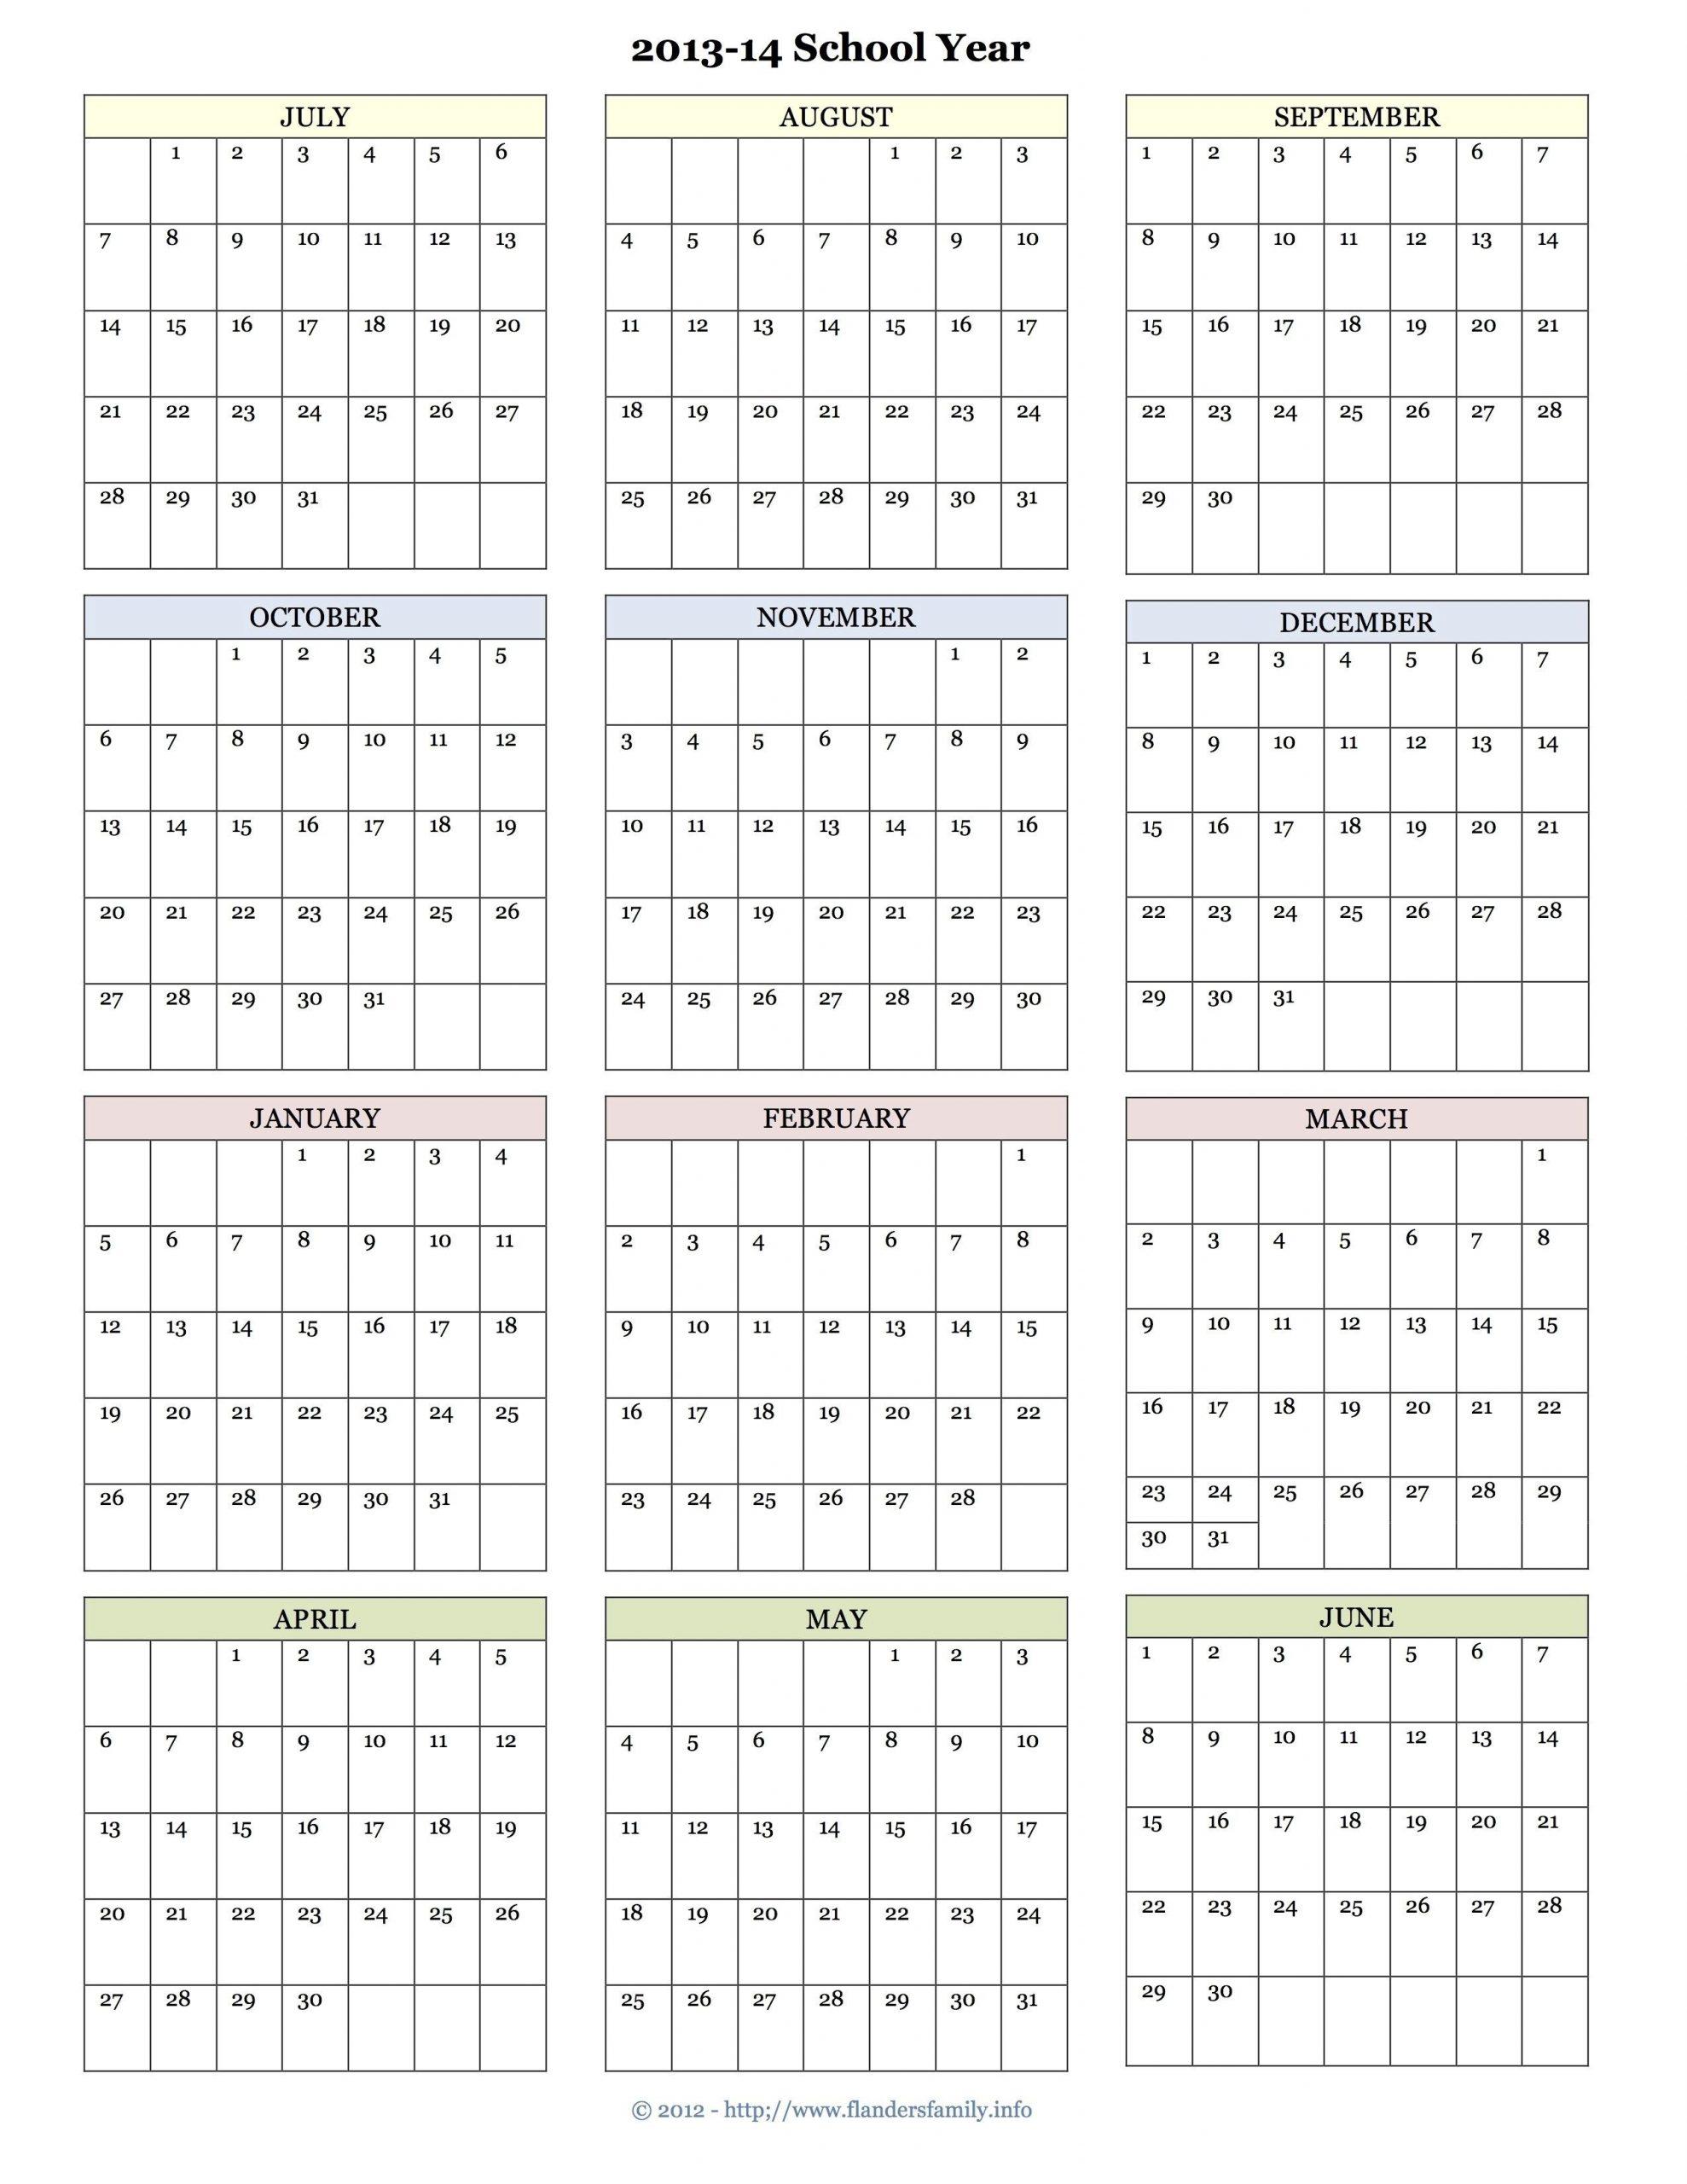 Depo Shot Calendar 2019 Depo Provera Injection Calendar 2018  Depo Provera Injection Schedule Calendar 2021